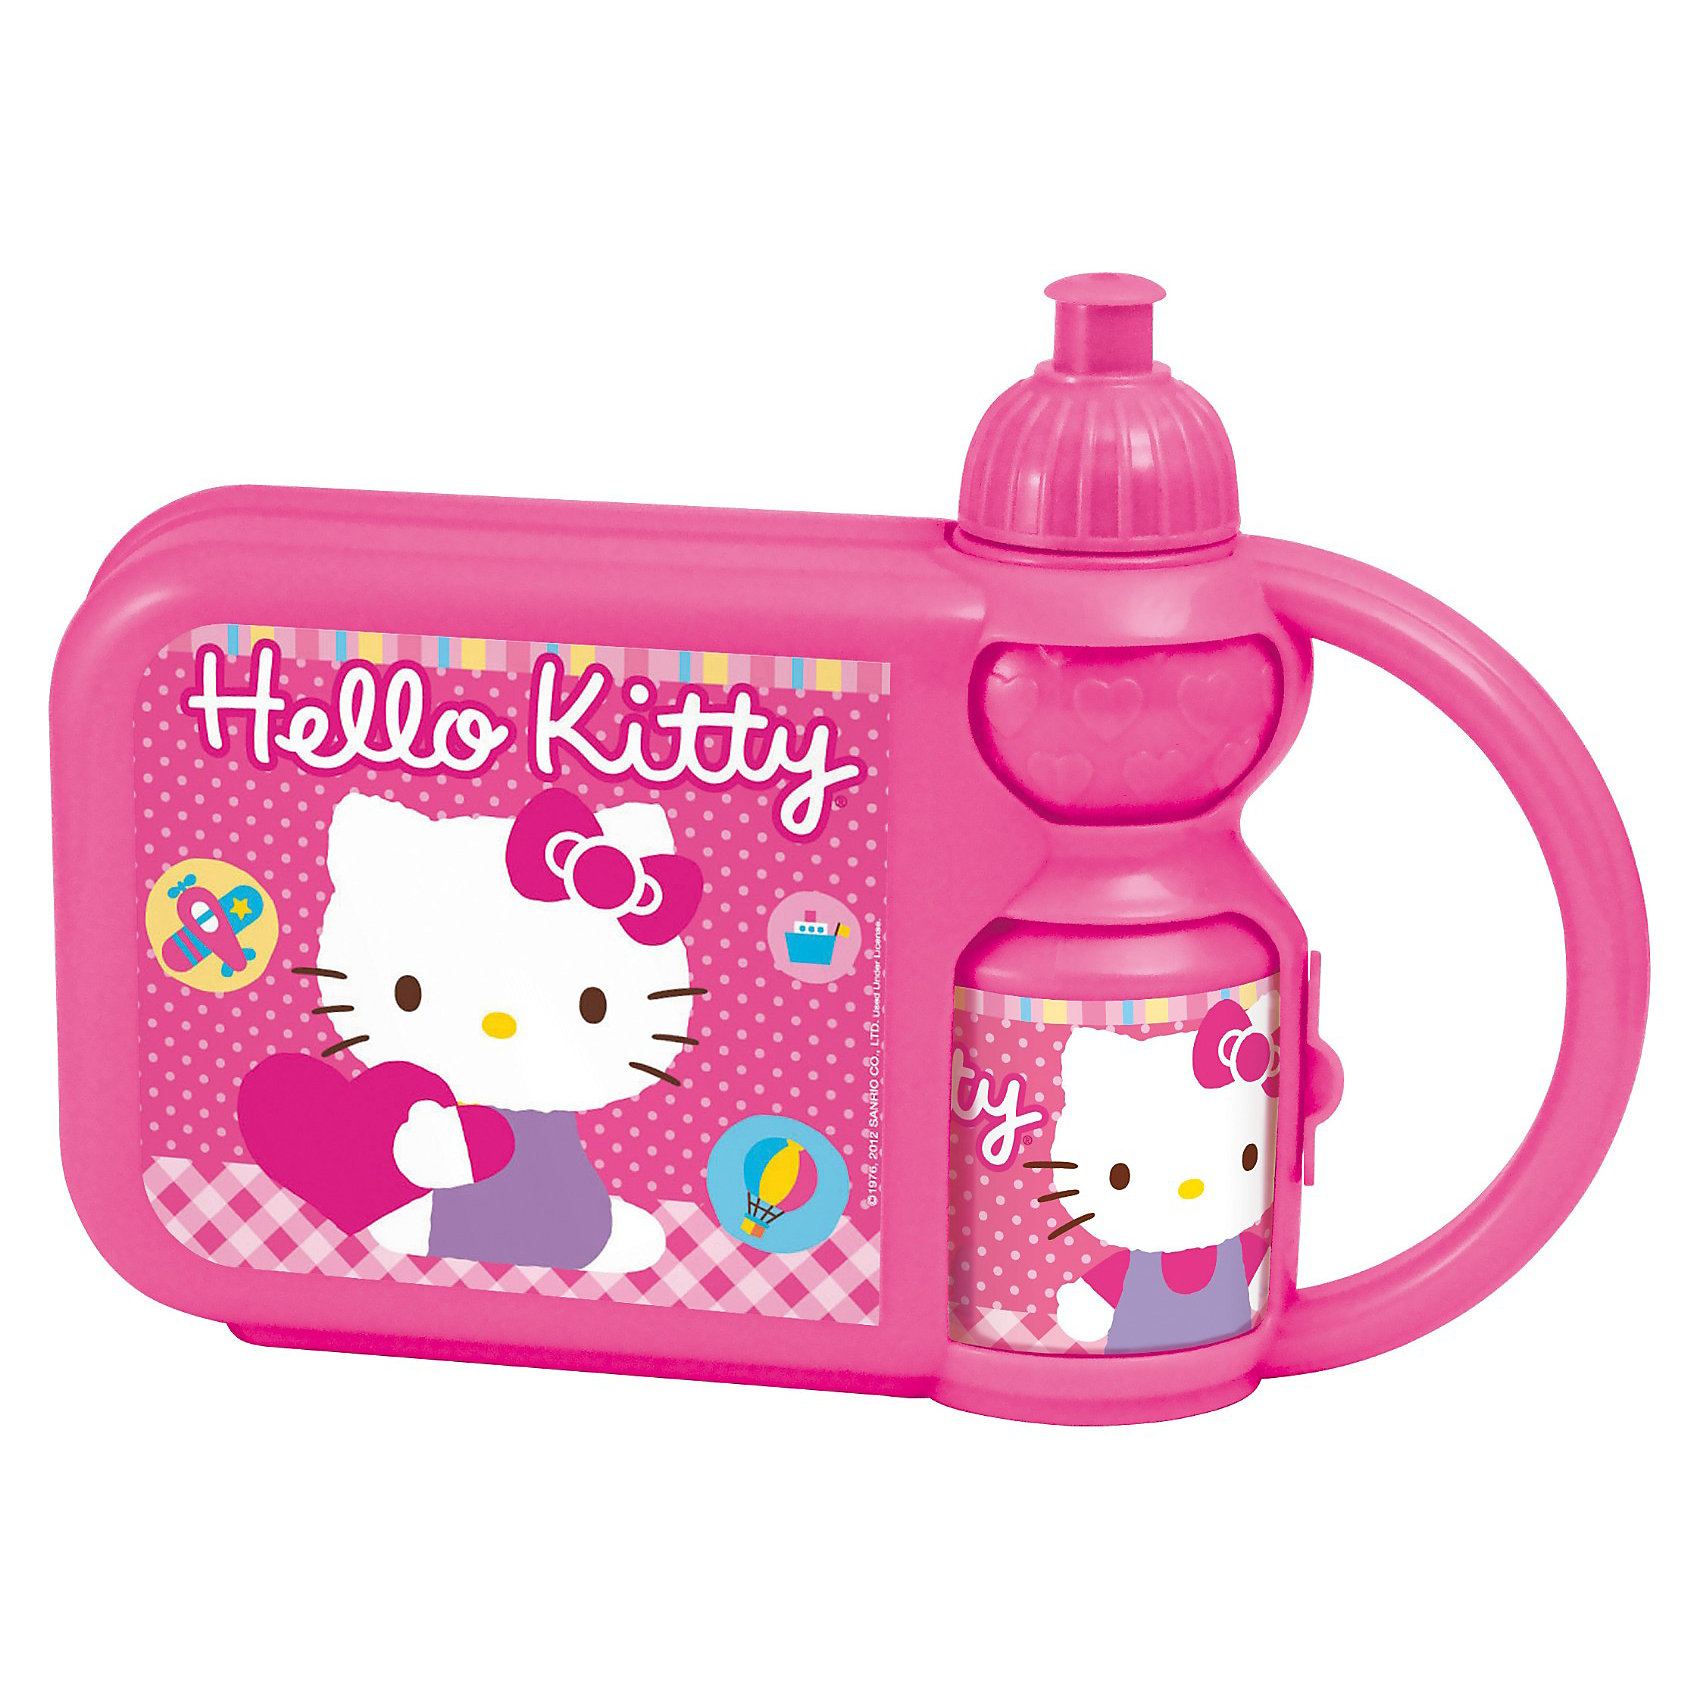 Контейнер для бутербродов с бутылкой, Hello Kitty